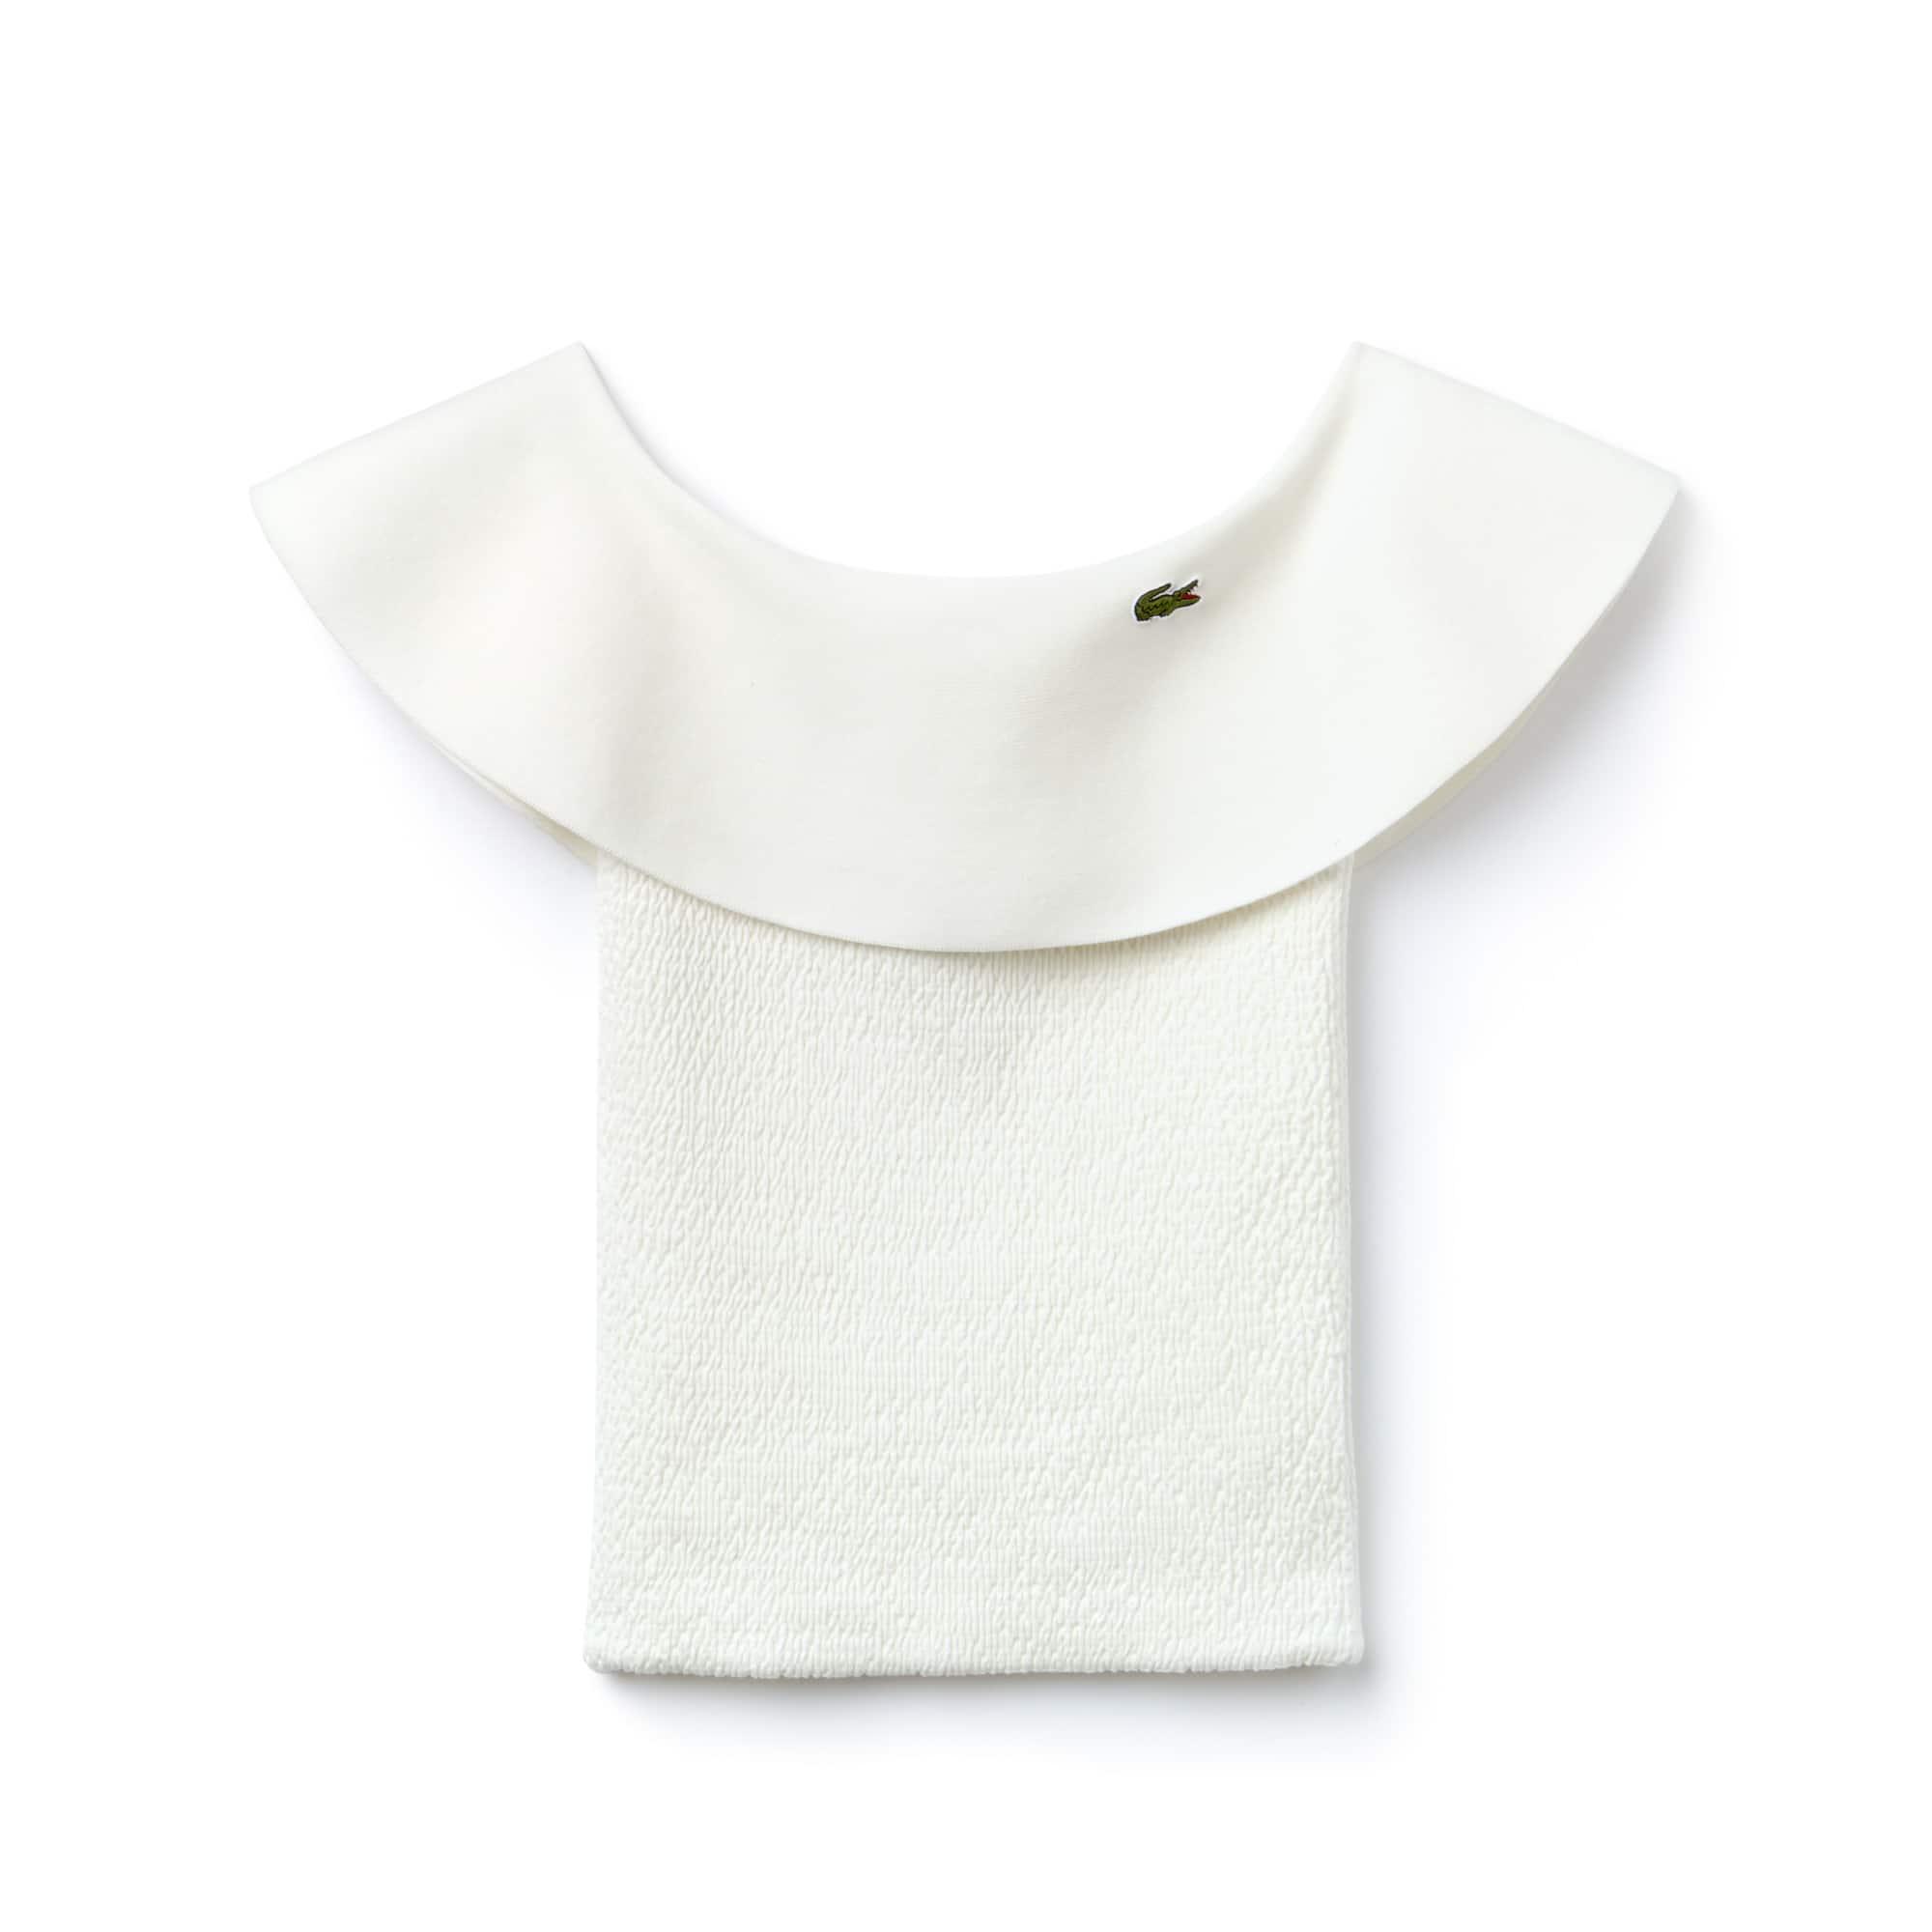 Women's Fashion Show Cotton Blend Knit Flounced Bustier